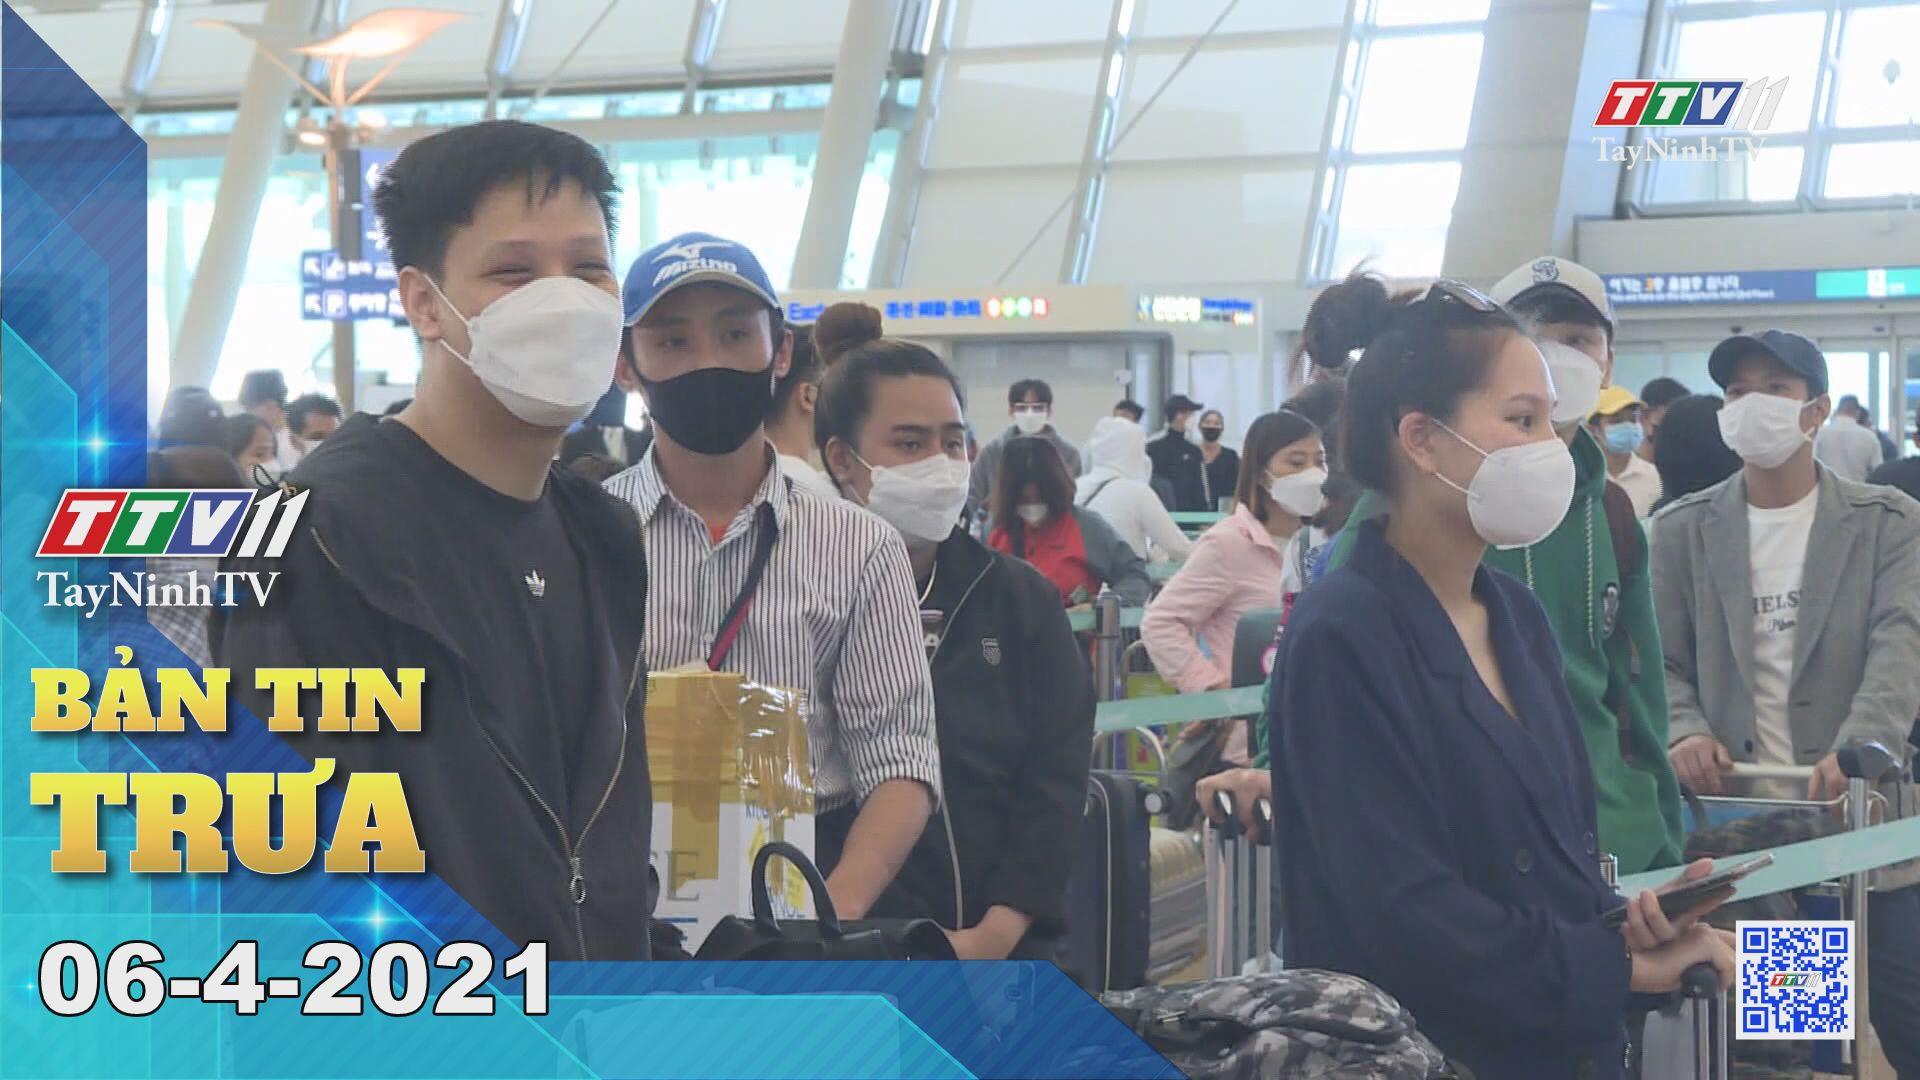 Bản tin trưa 06-4-2021 | Tin tức hôm nay | TayNinhTV